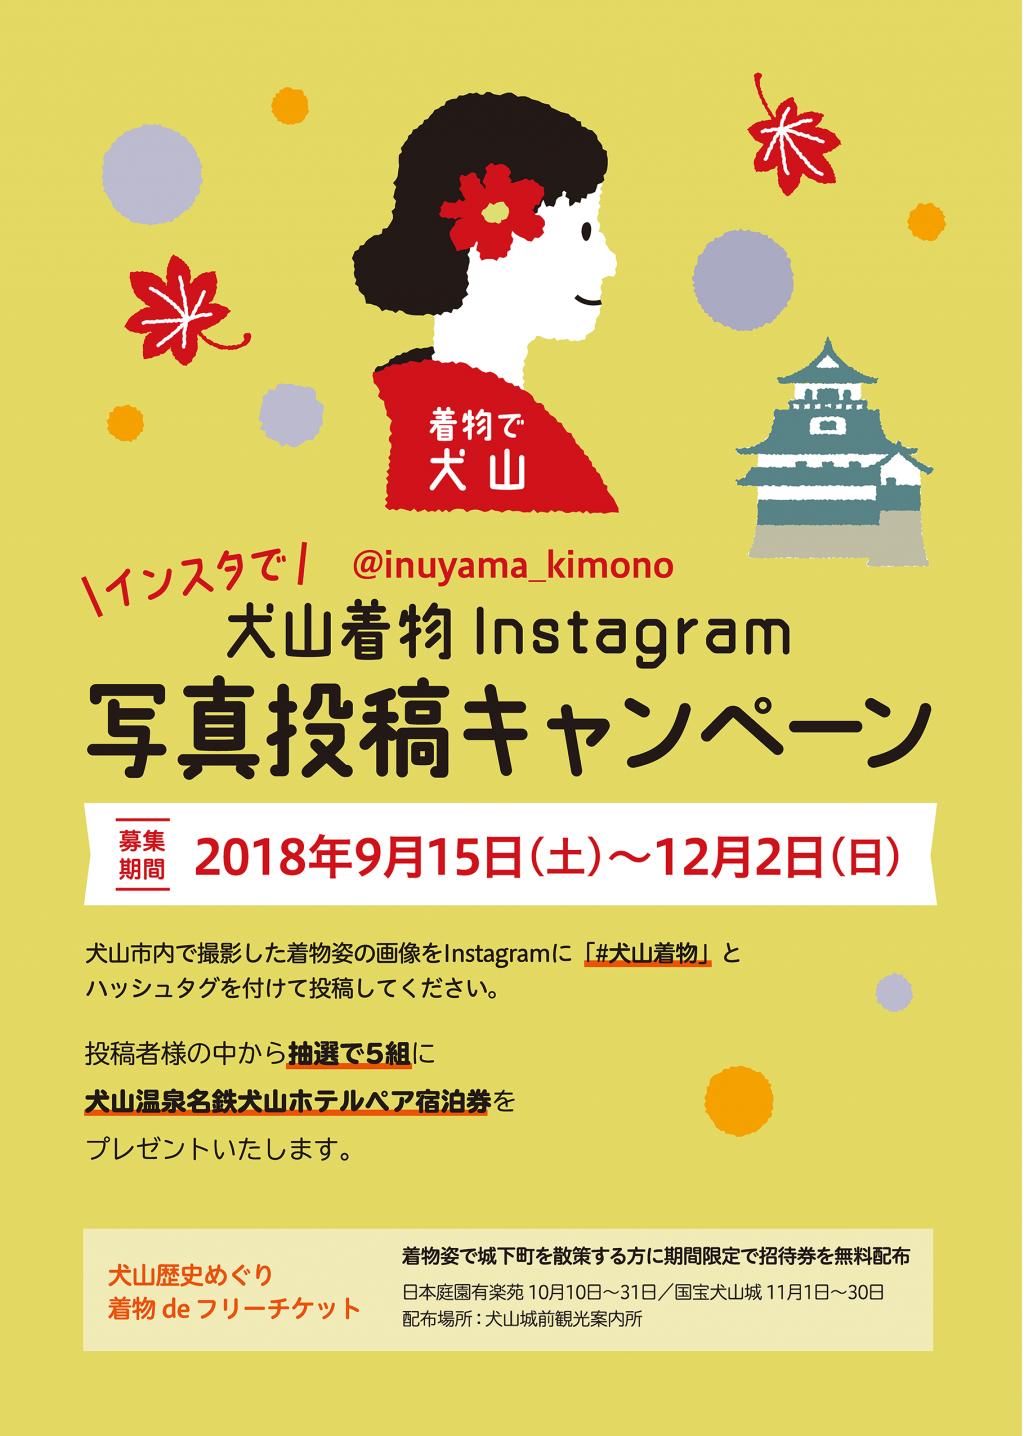 180800_kimono_instagram_nyu (1)_2